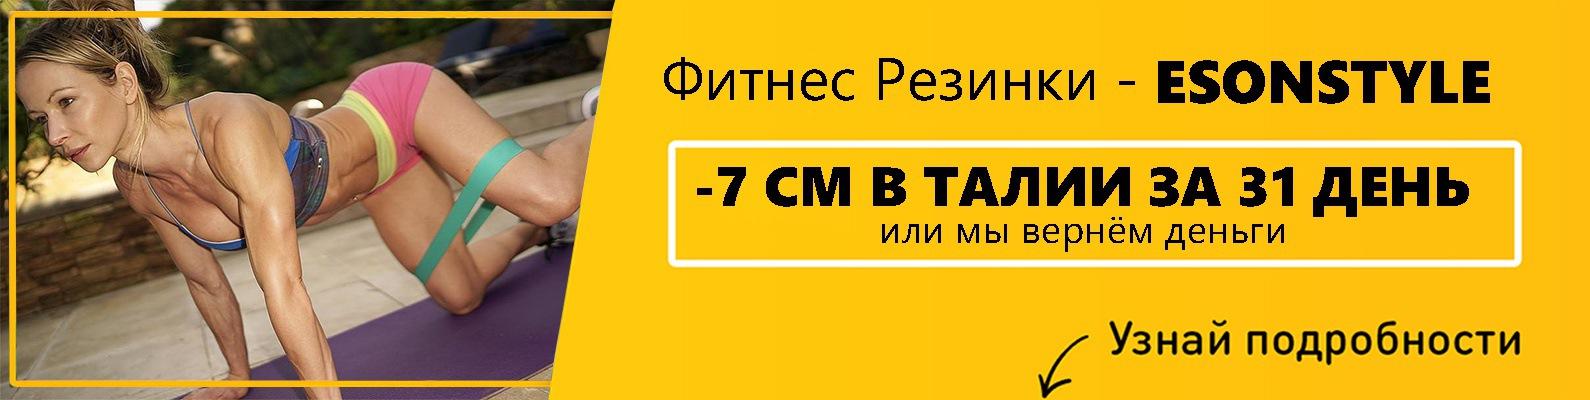 EsonStyle фитнес резинки купить в Мстиславле